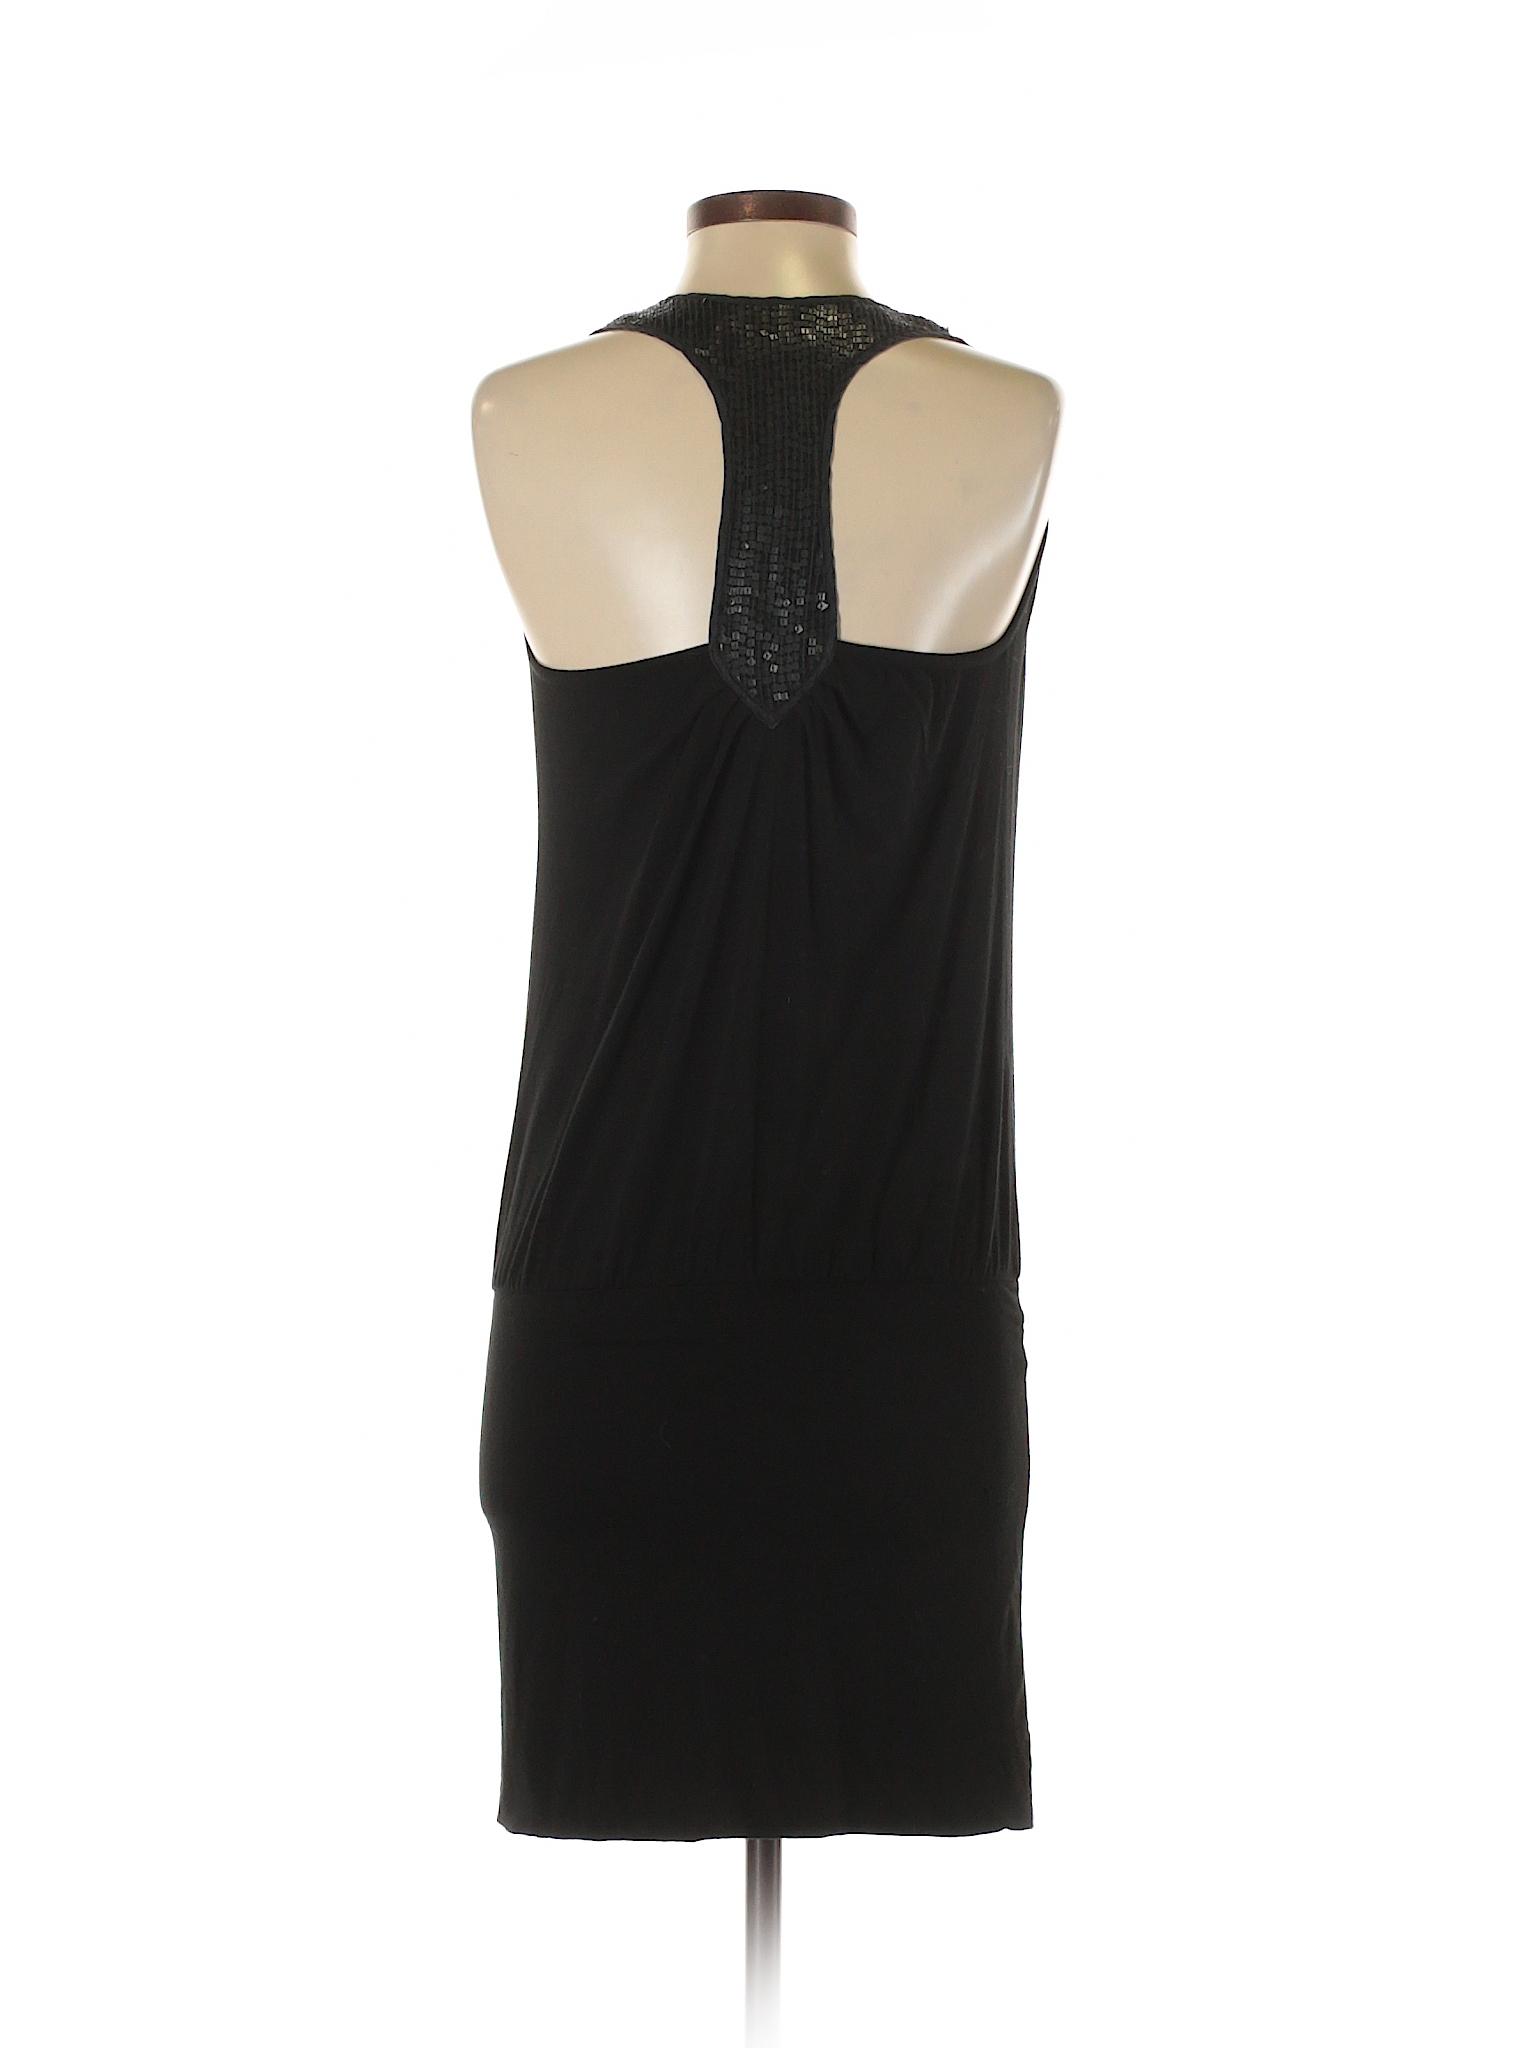 Akiko Casual Akiko Dress Dress Casual Selling Akiko Selling Casual Selling 04qwO